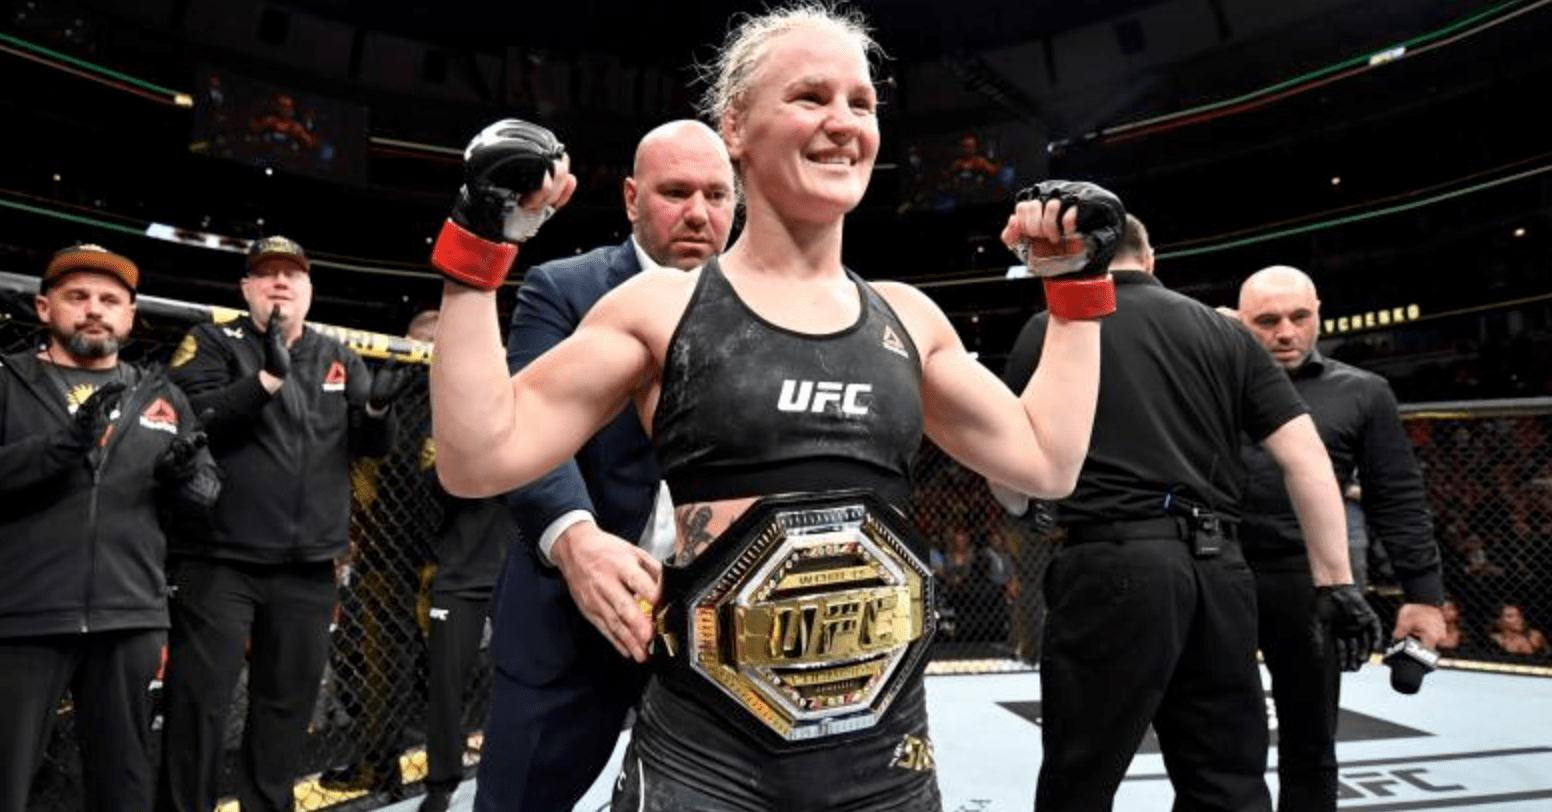 Valentina Shevchenko To Defend Title At UFC Uruguay